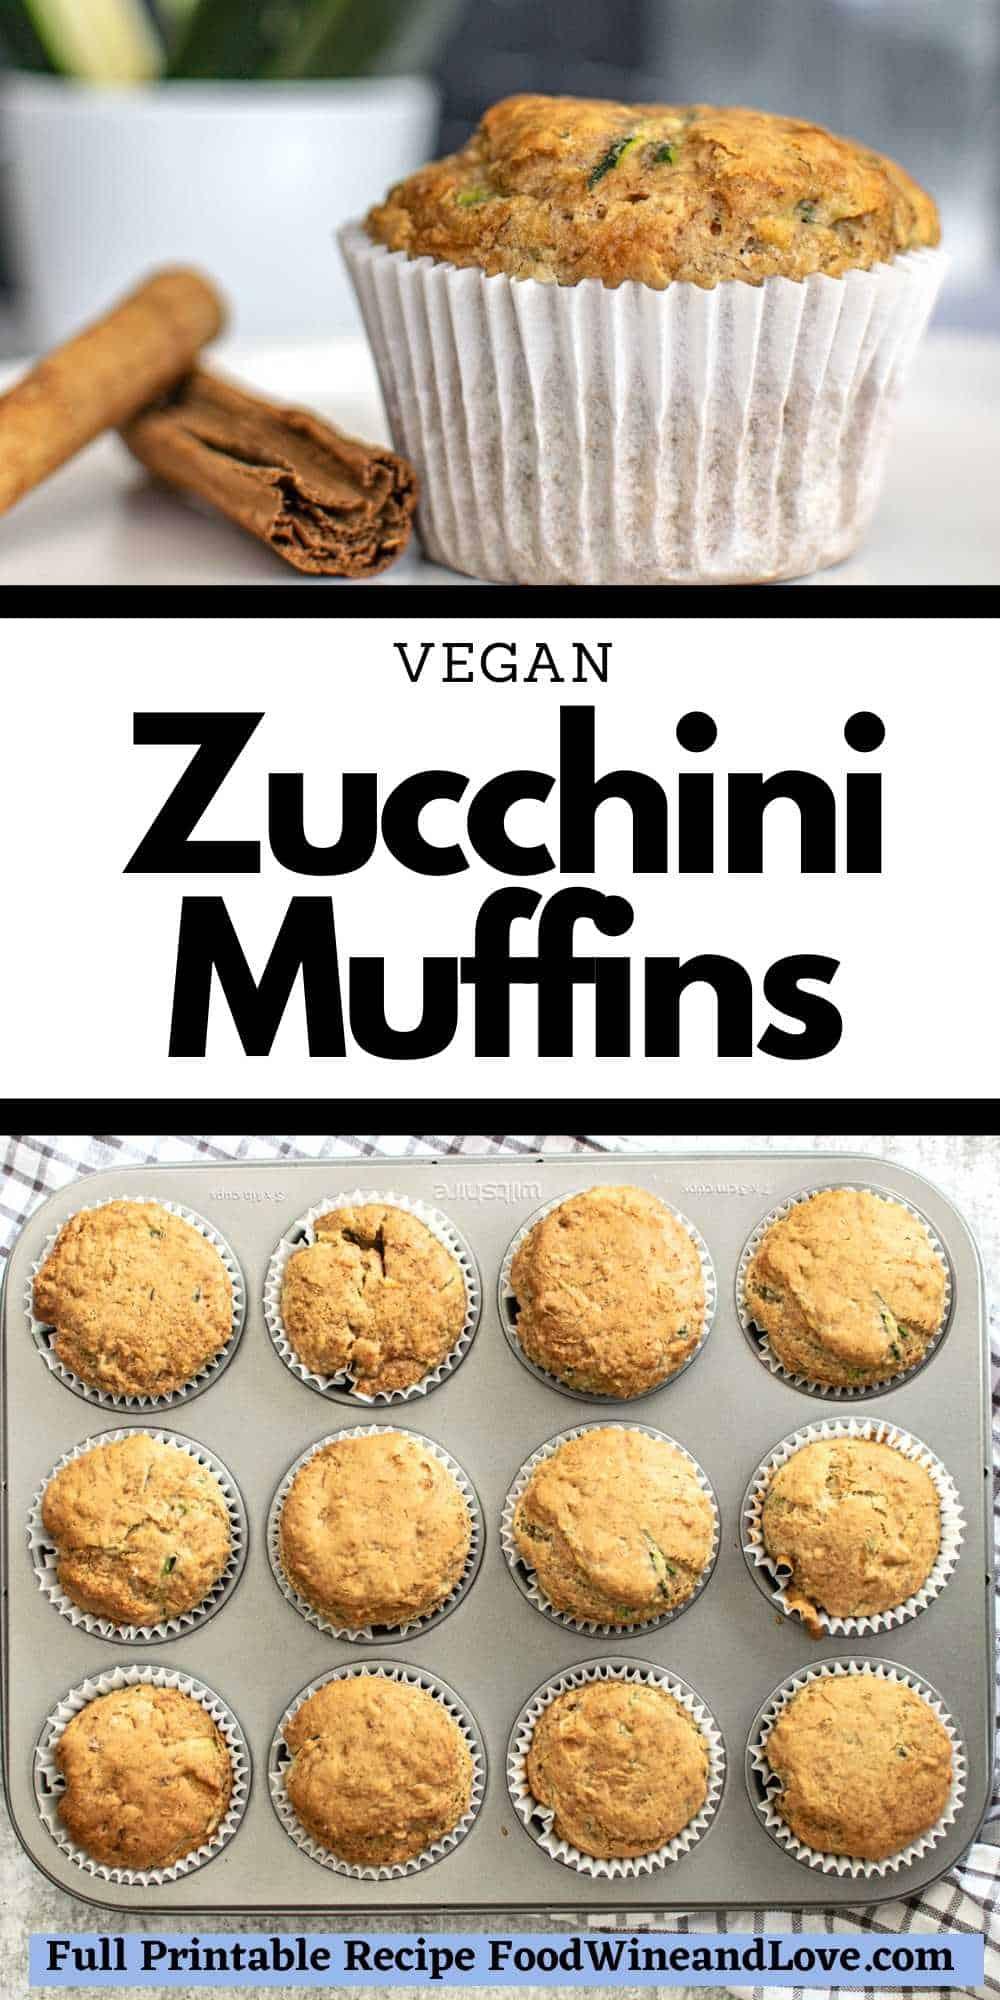 Vegan Zucchini Muffins